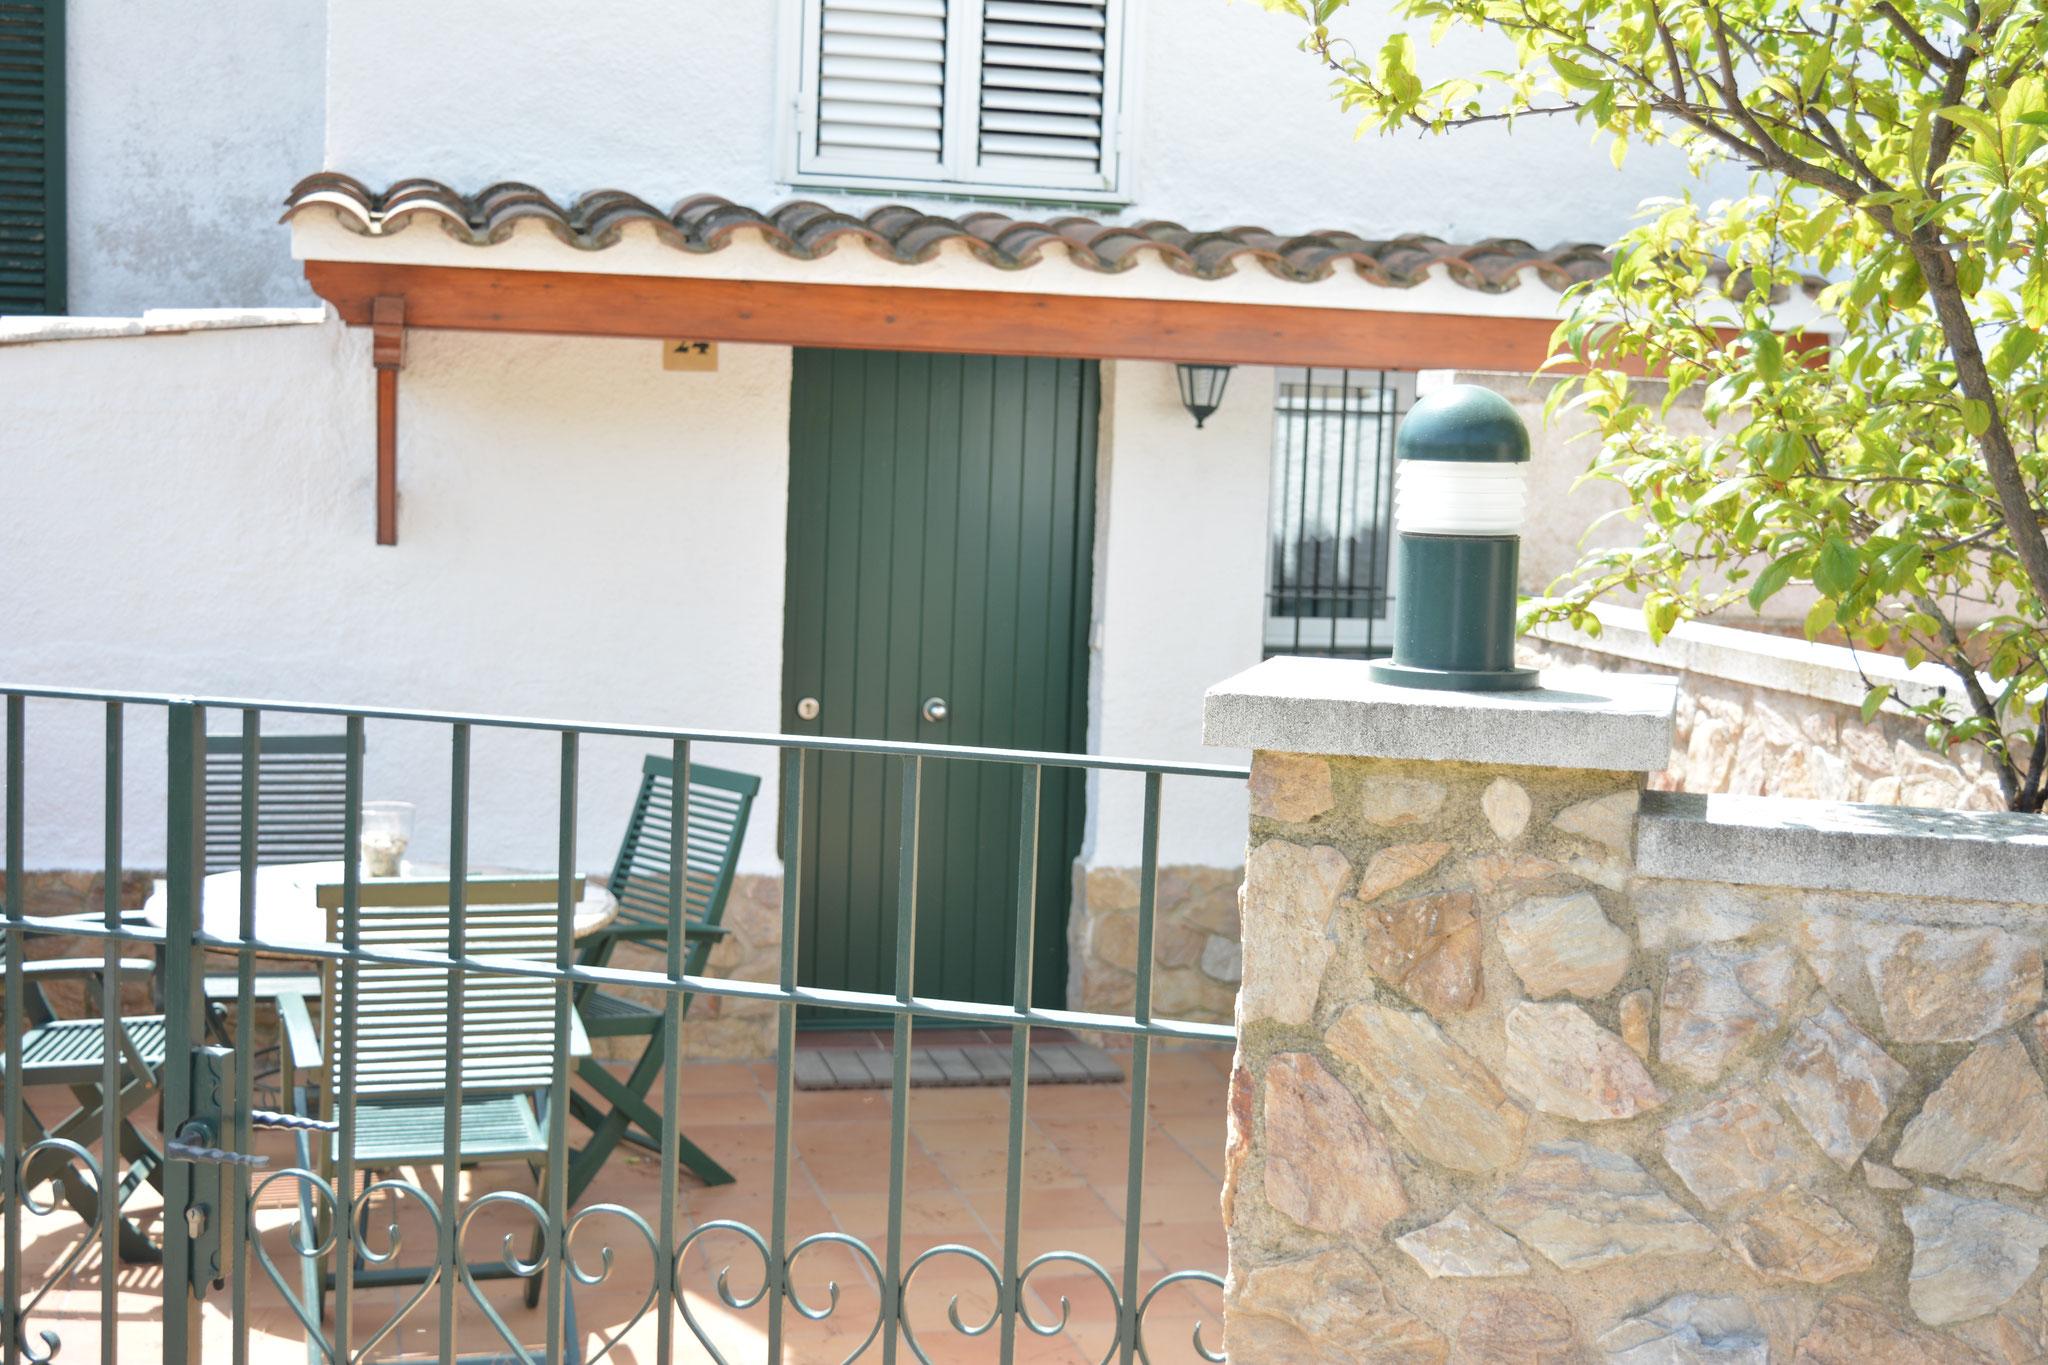 Entrance courtyard house